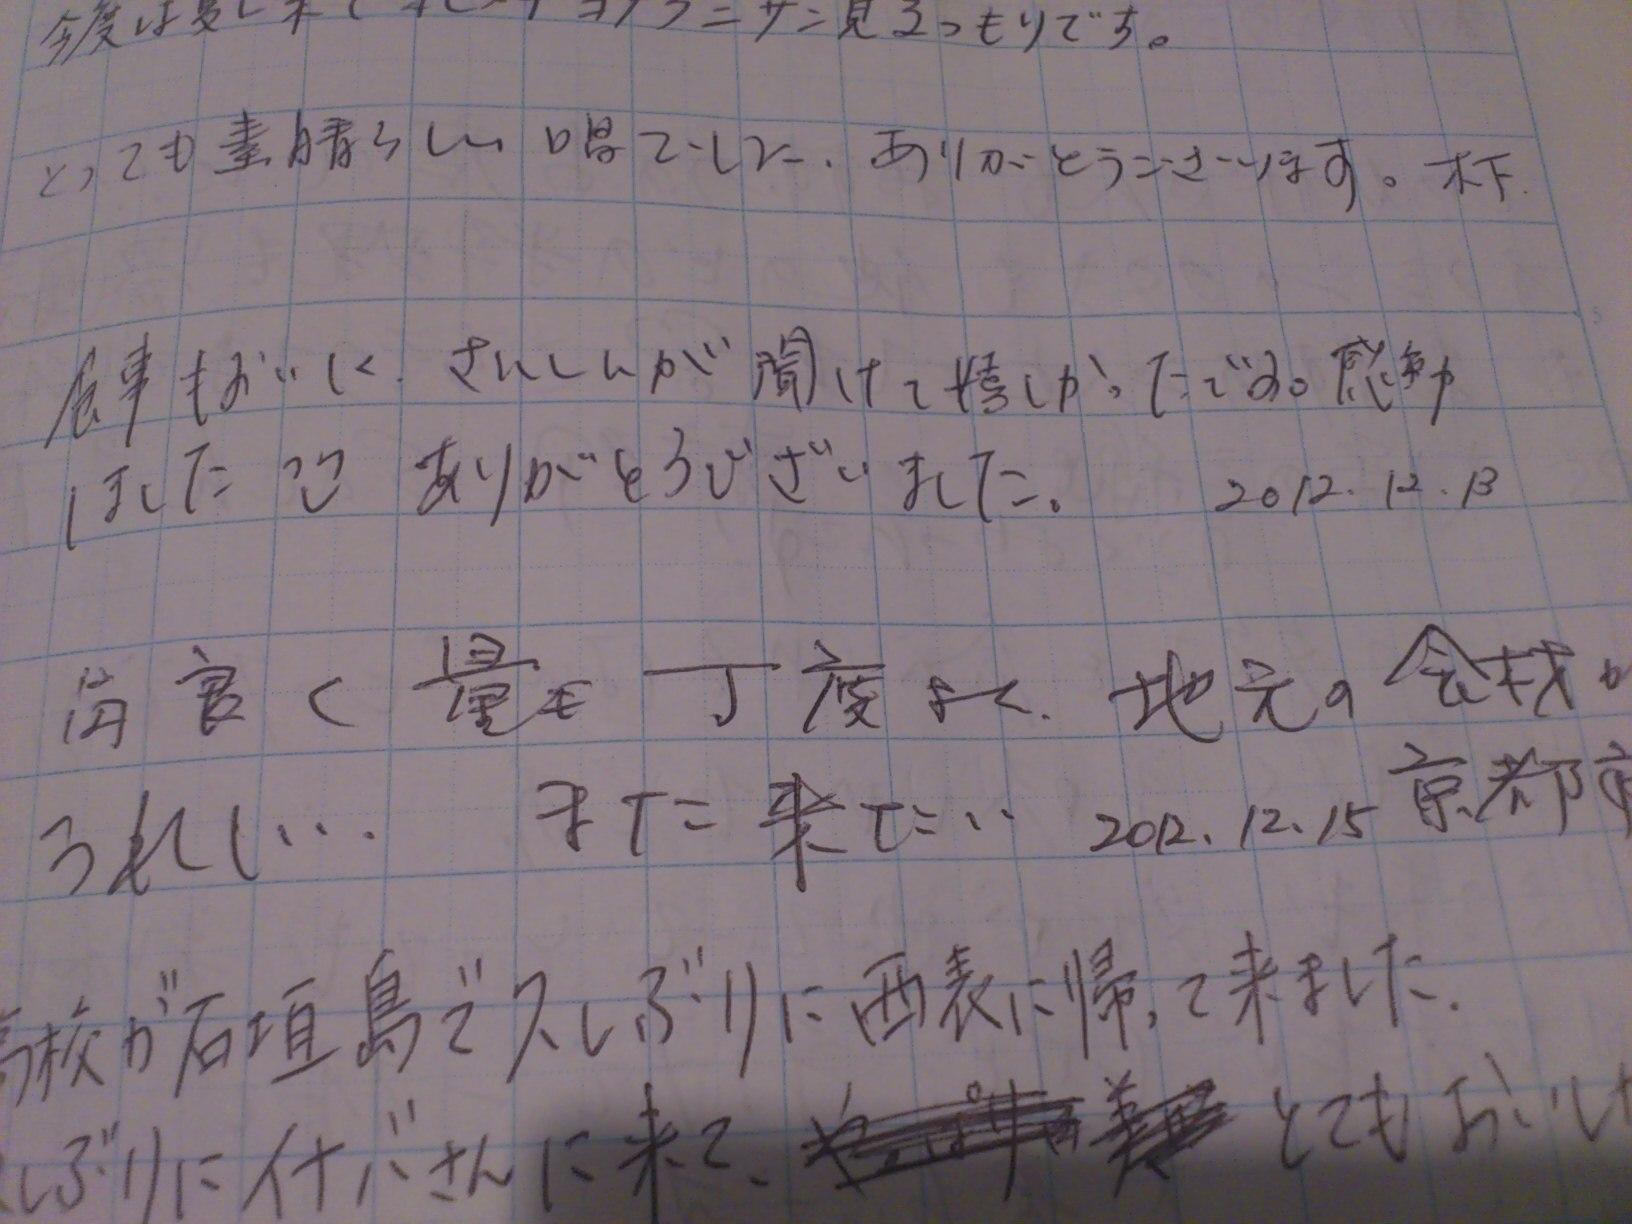 fc2blog_20121221105746835.jpg